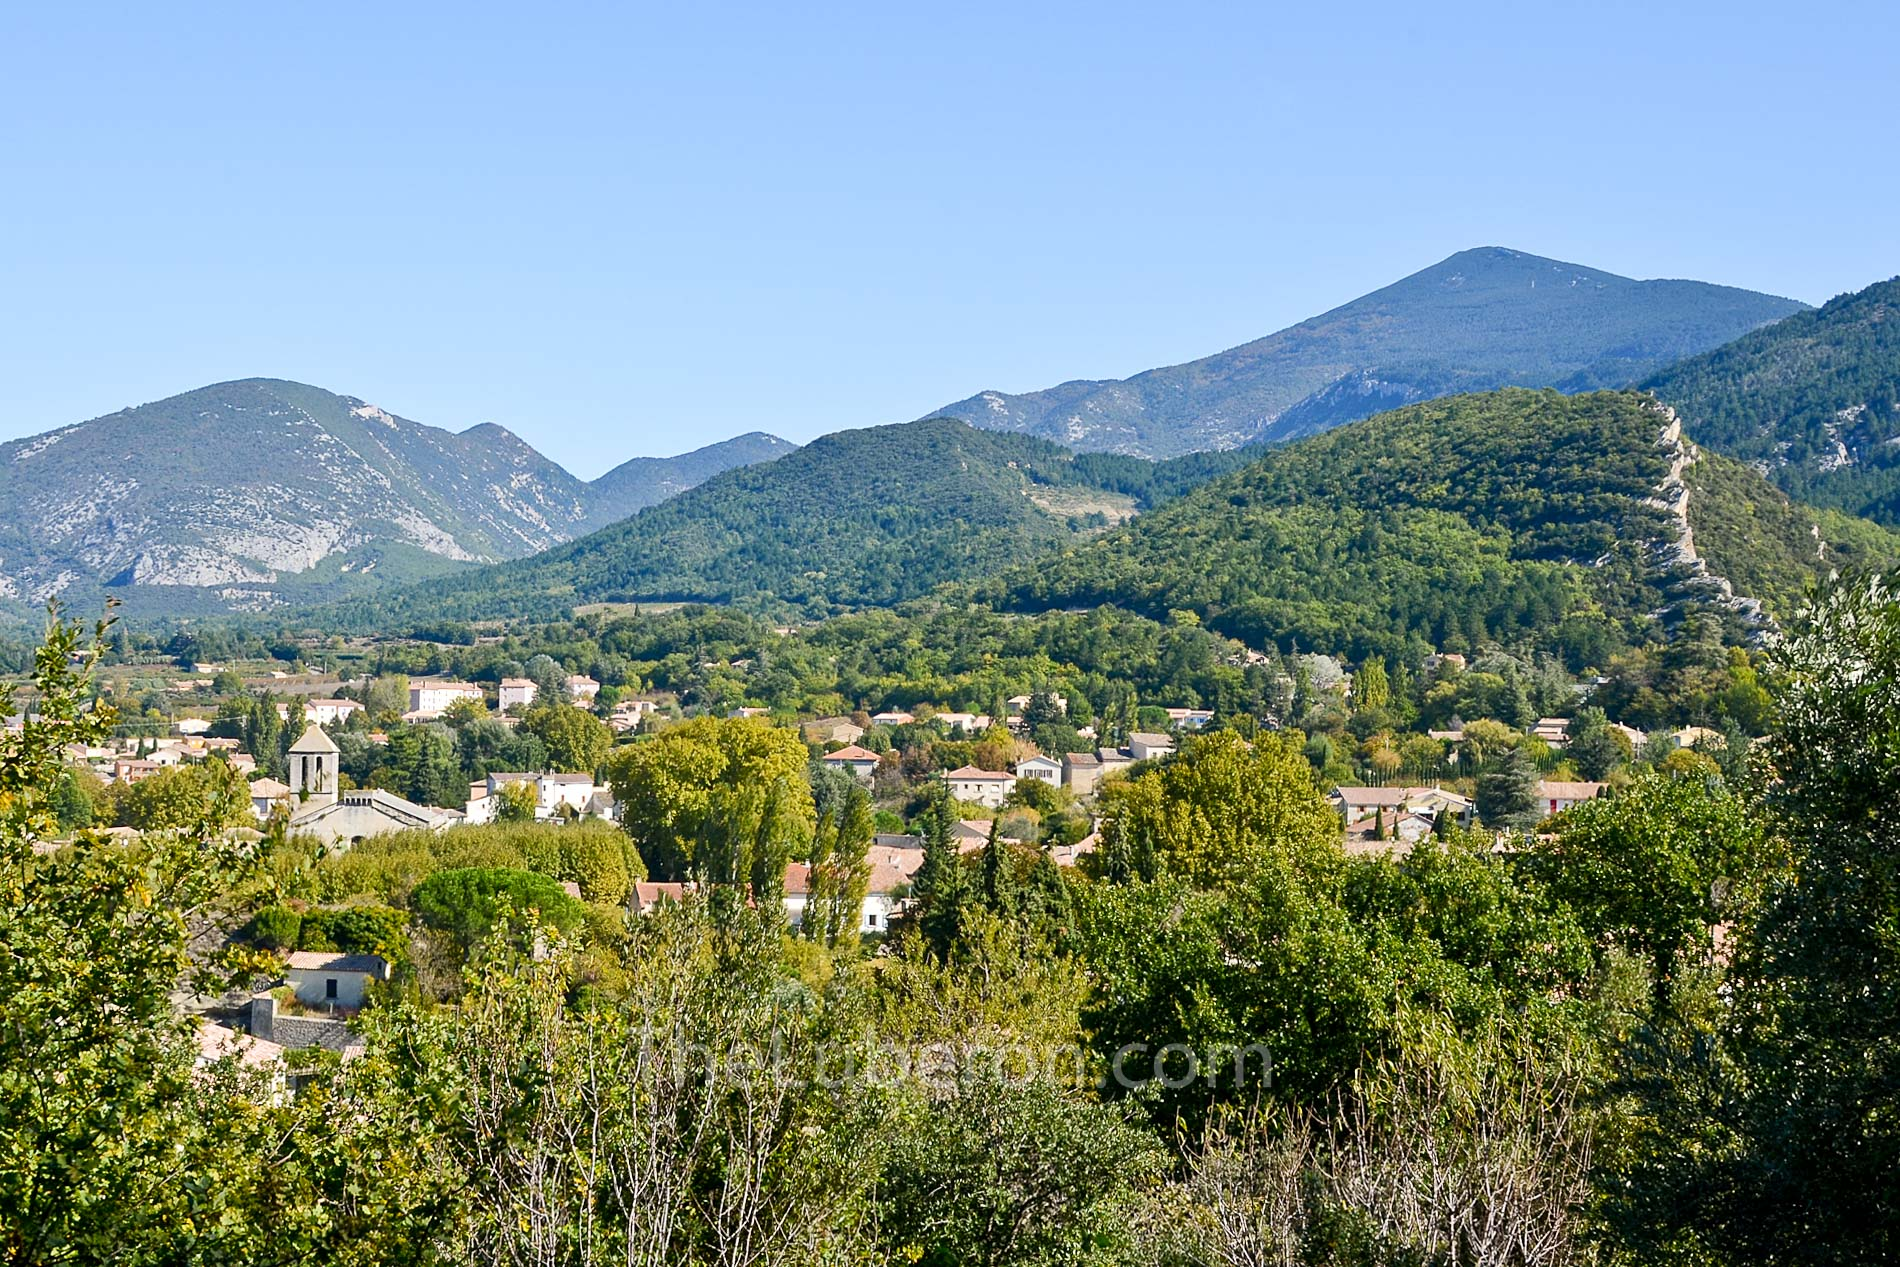 Malaucene and the hills